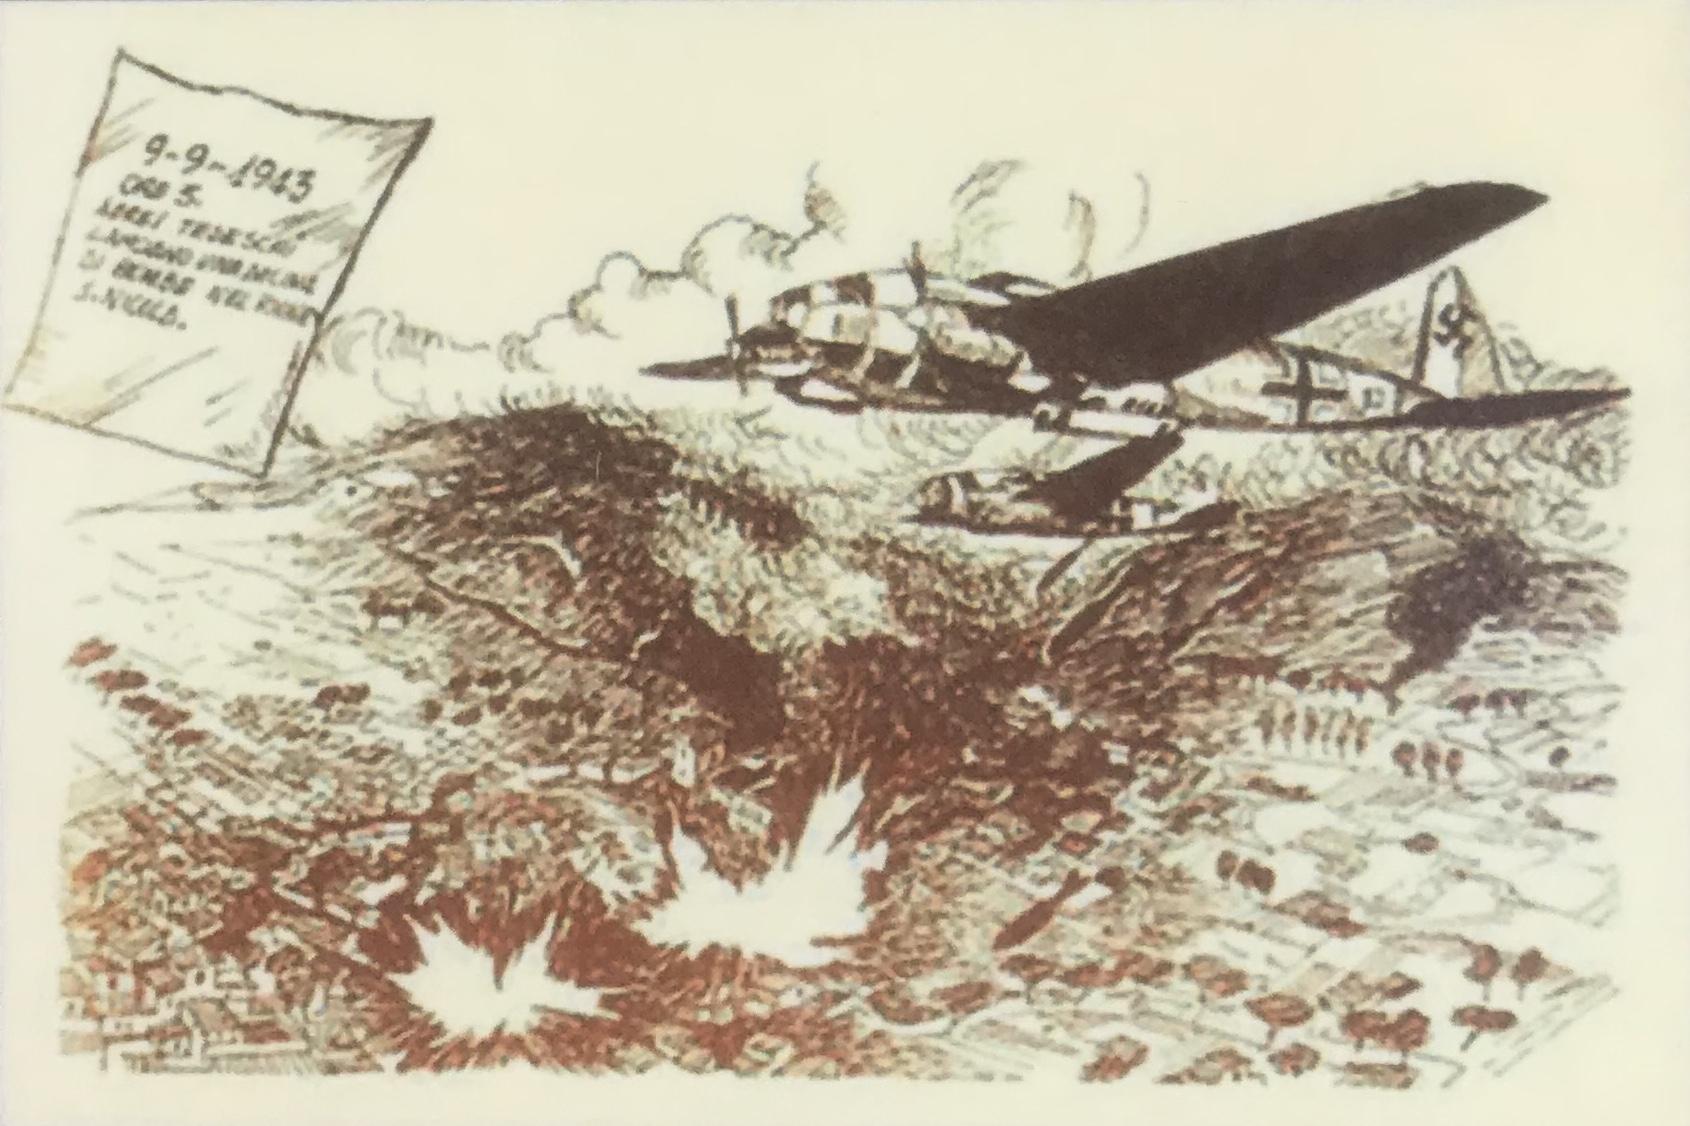 1943 mondragone